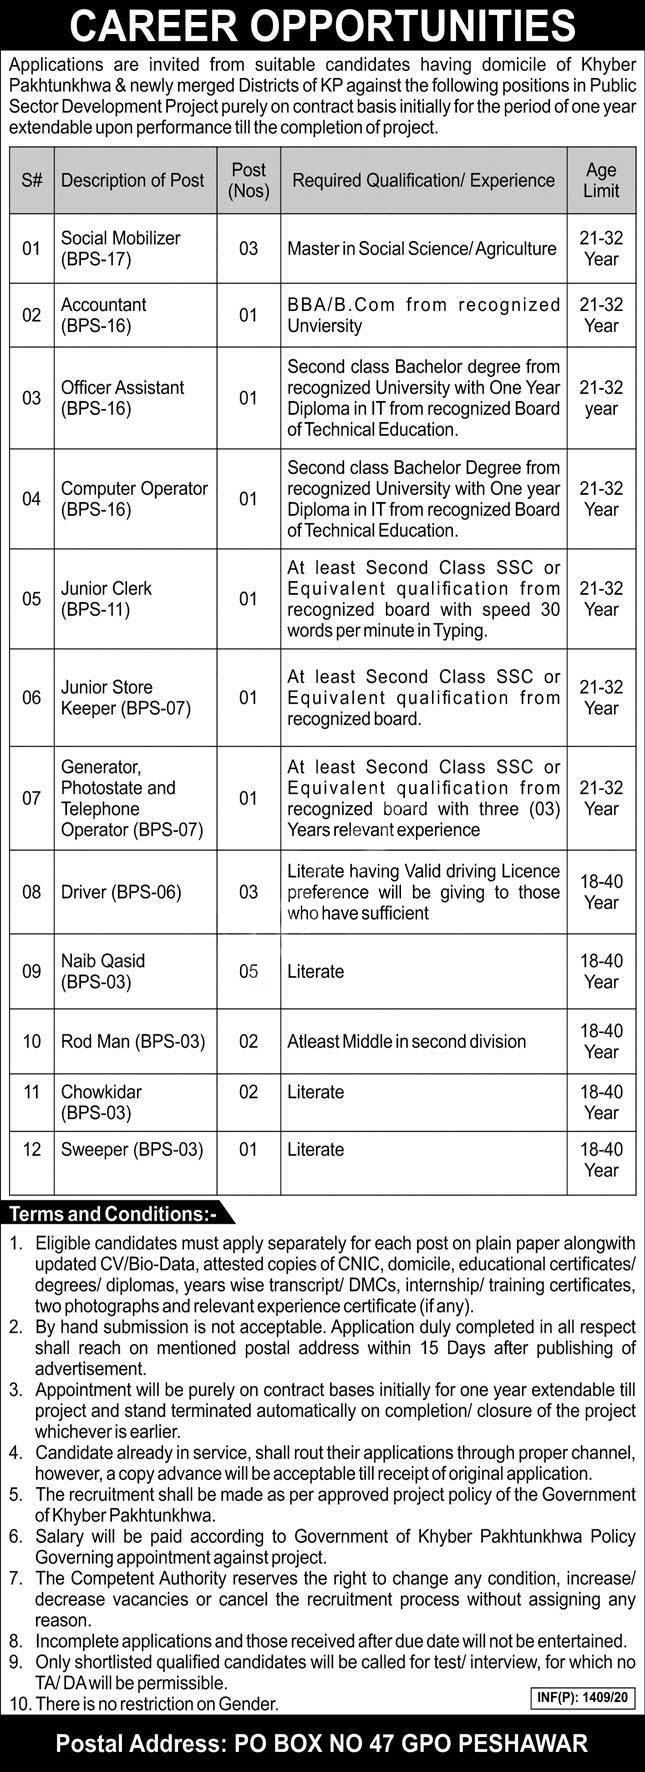 Po Box No.47 Gpo Peshawar Public Sector Organization Jobs 2020 Latest